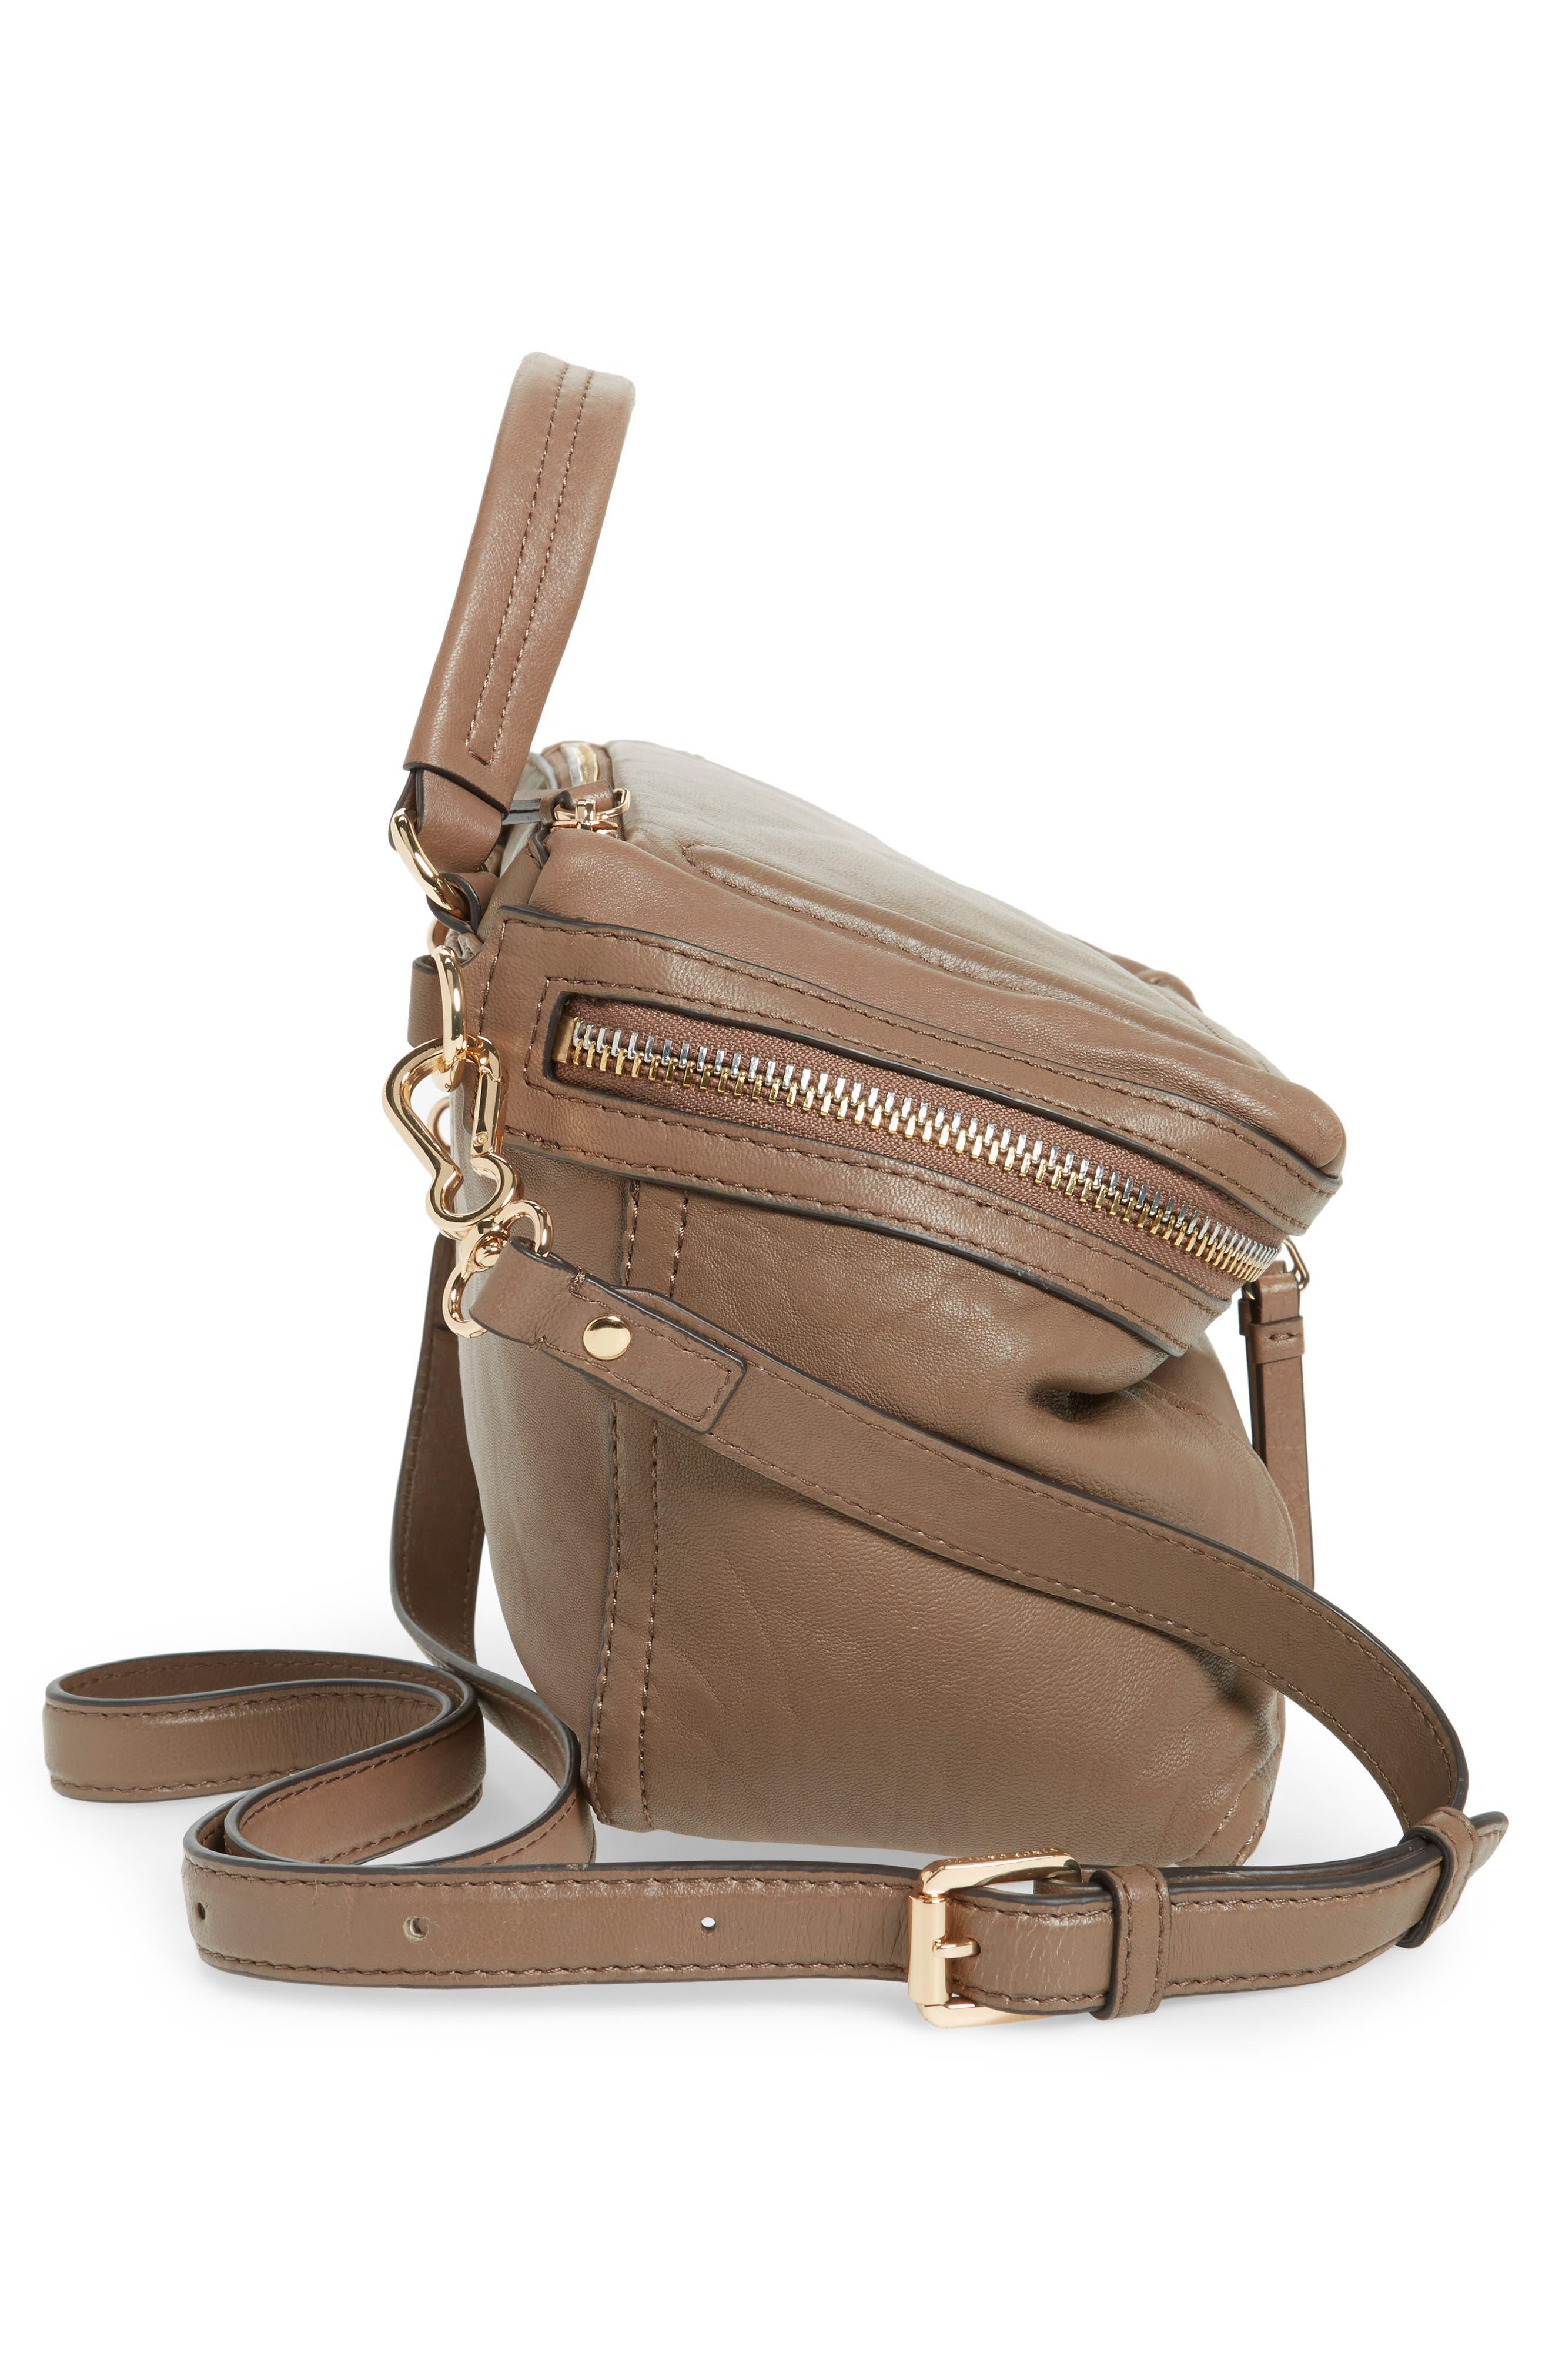 Medium Patch Leather Crossbody Bag,                             Alternate thumbnail 10, color,